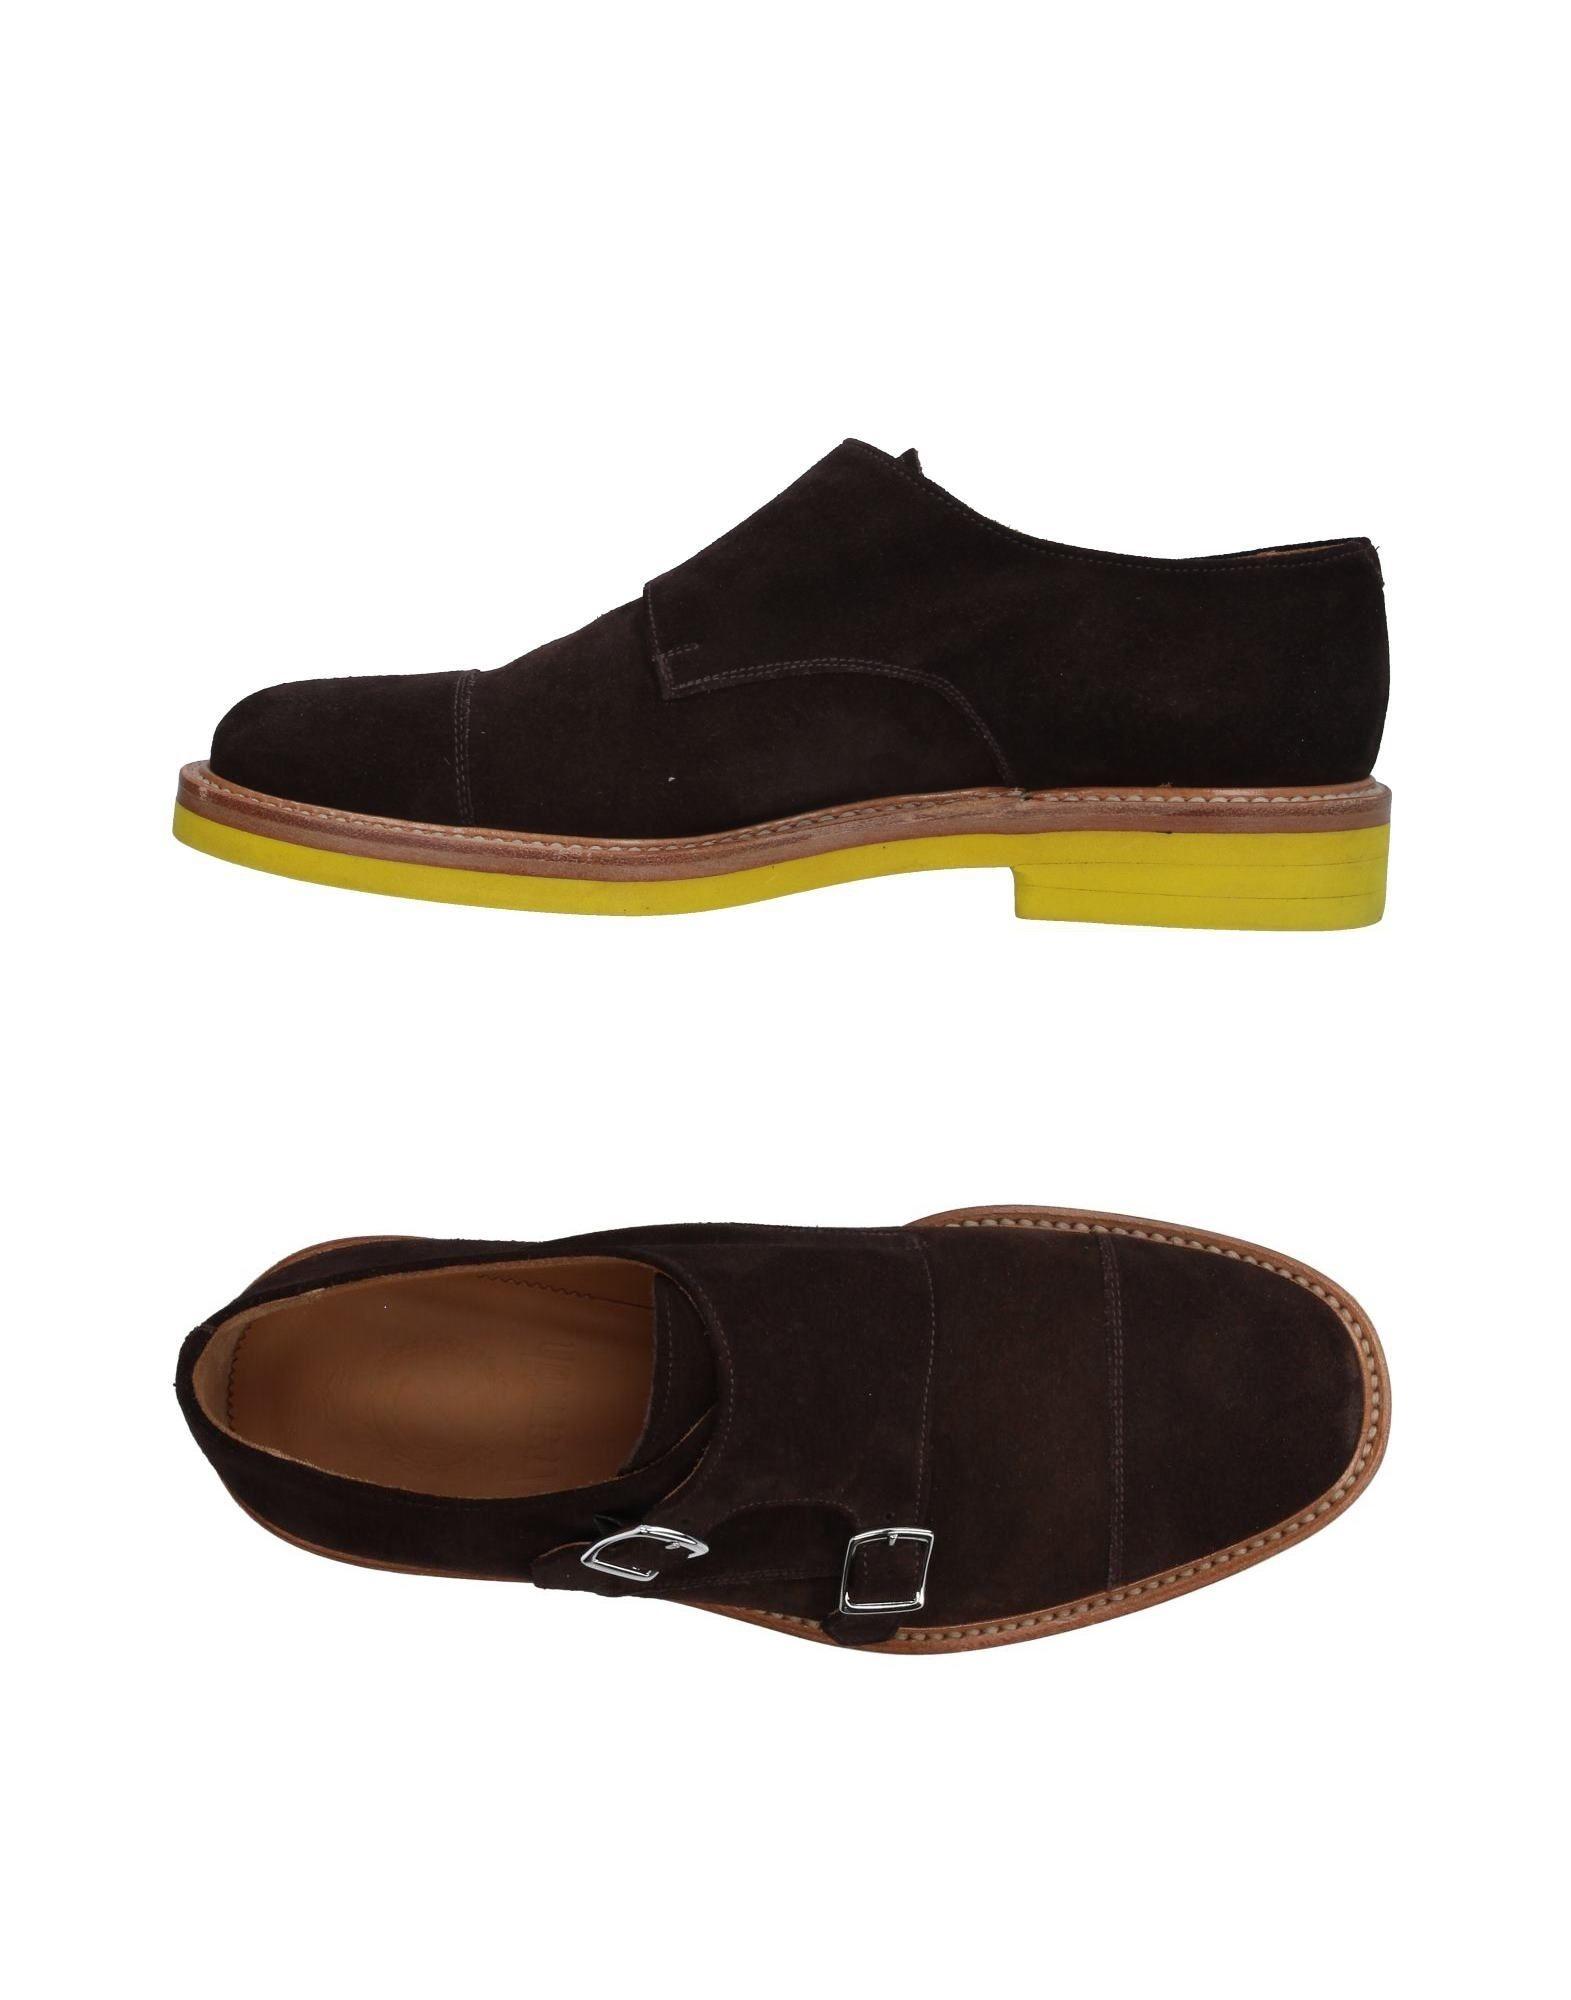 Aranth Mokassins Herren  11298181DP Gute Qualität beliebte Schuhe